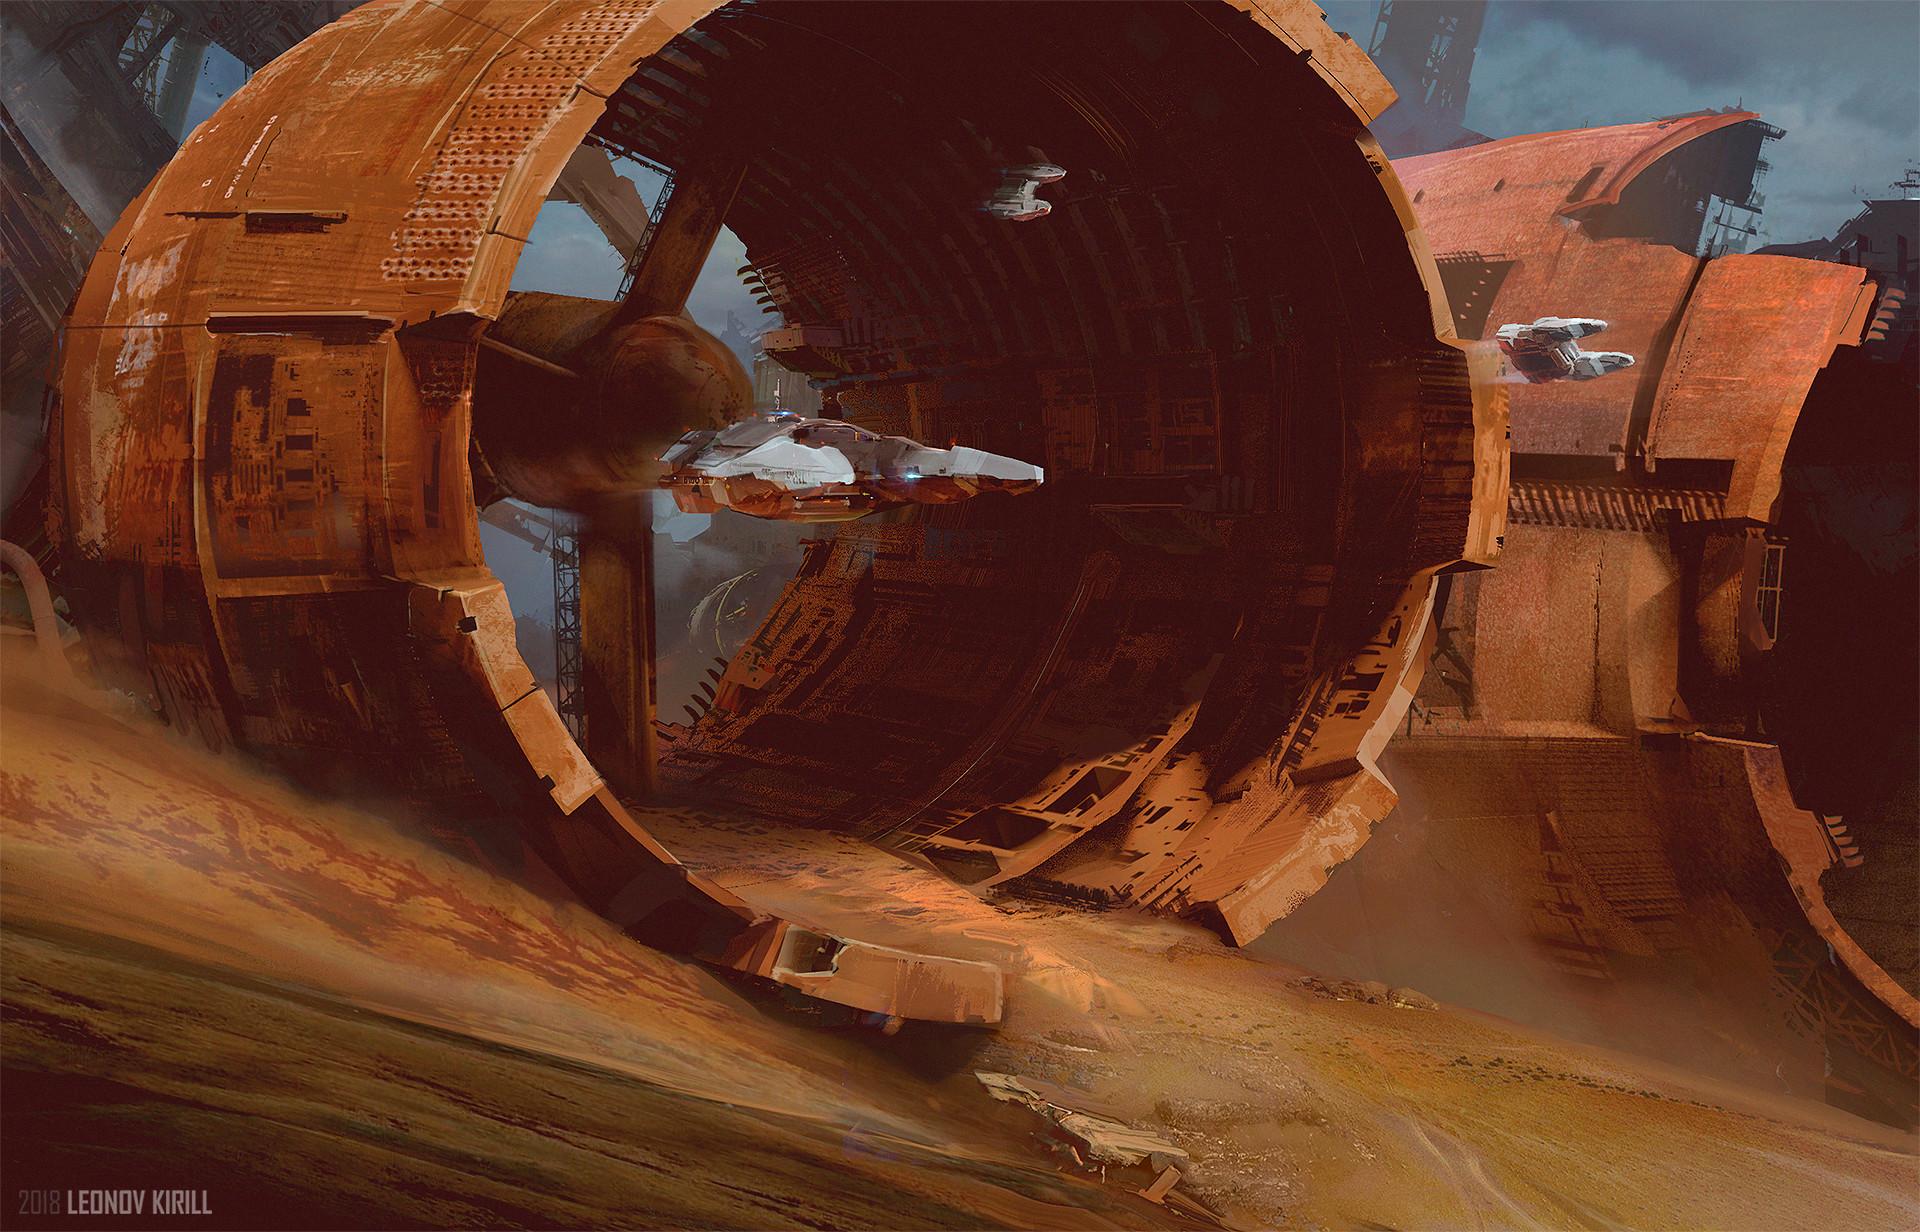 kirill-leonov-shipwreck00.jpg?1540820841